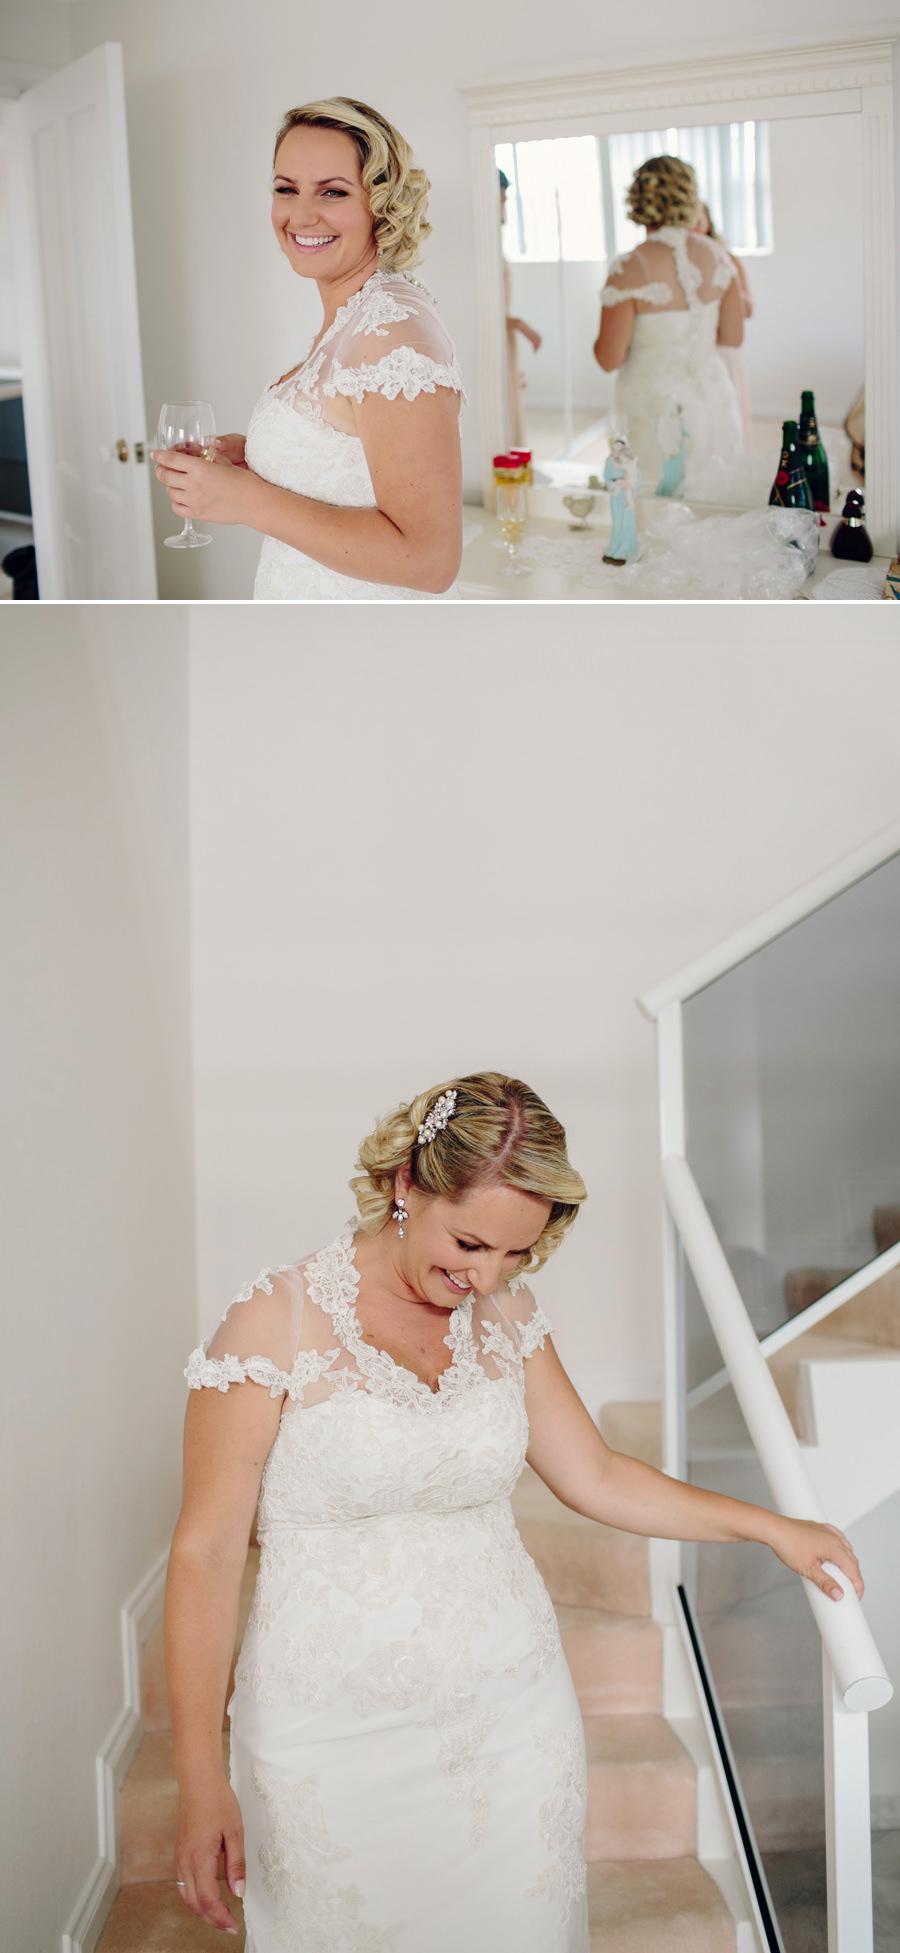 Timeless Wedding Photographer: Bride leaving for ceremony